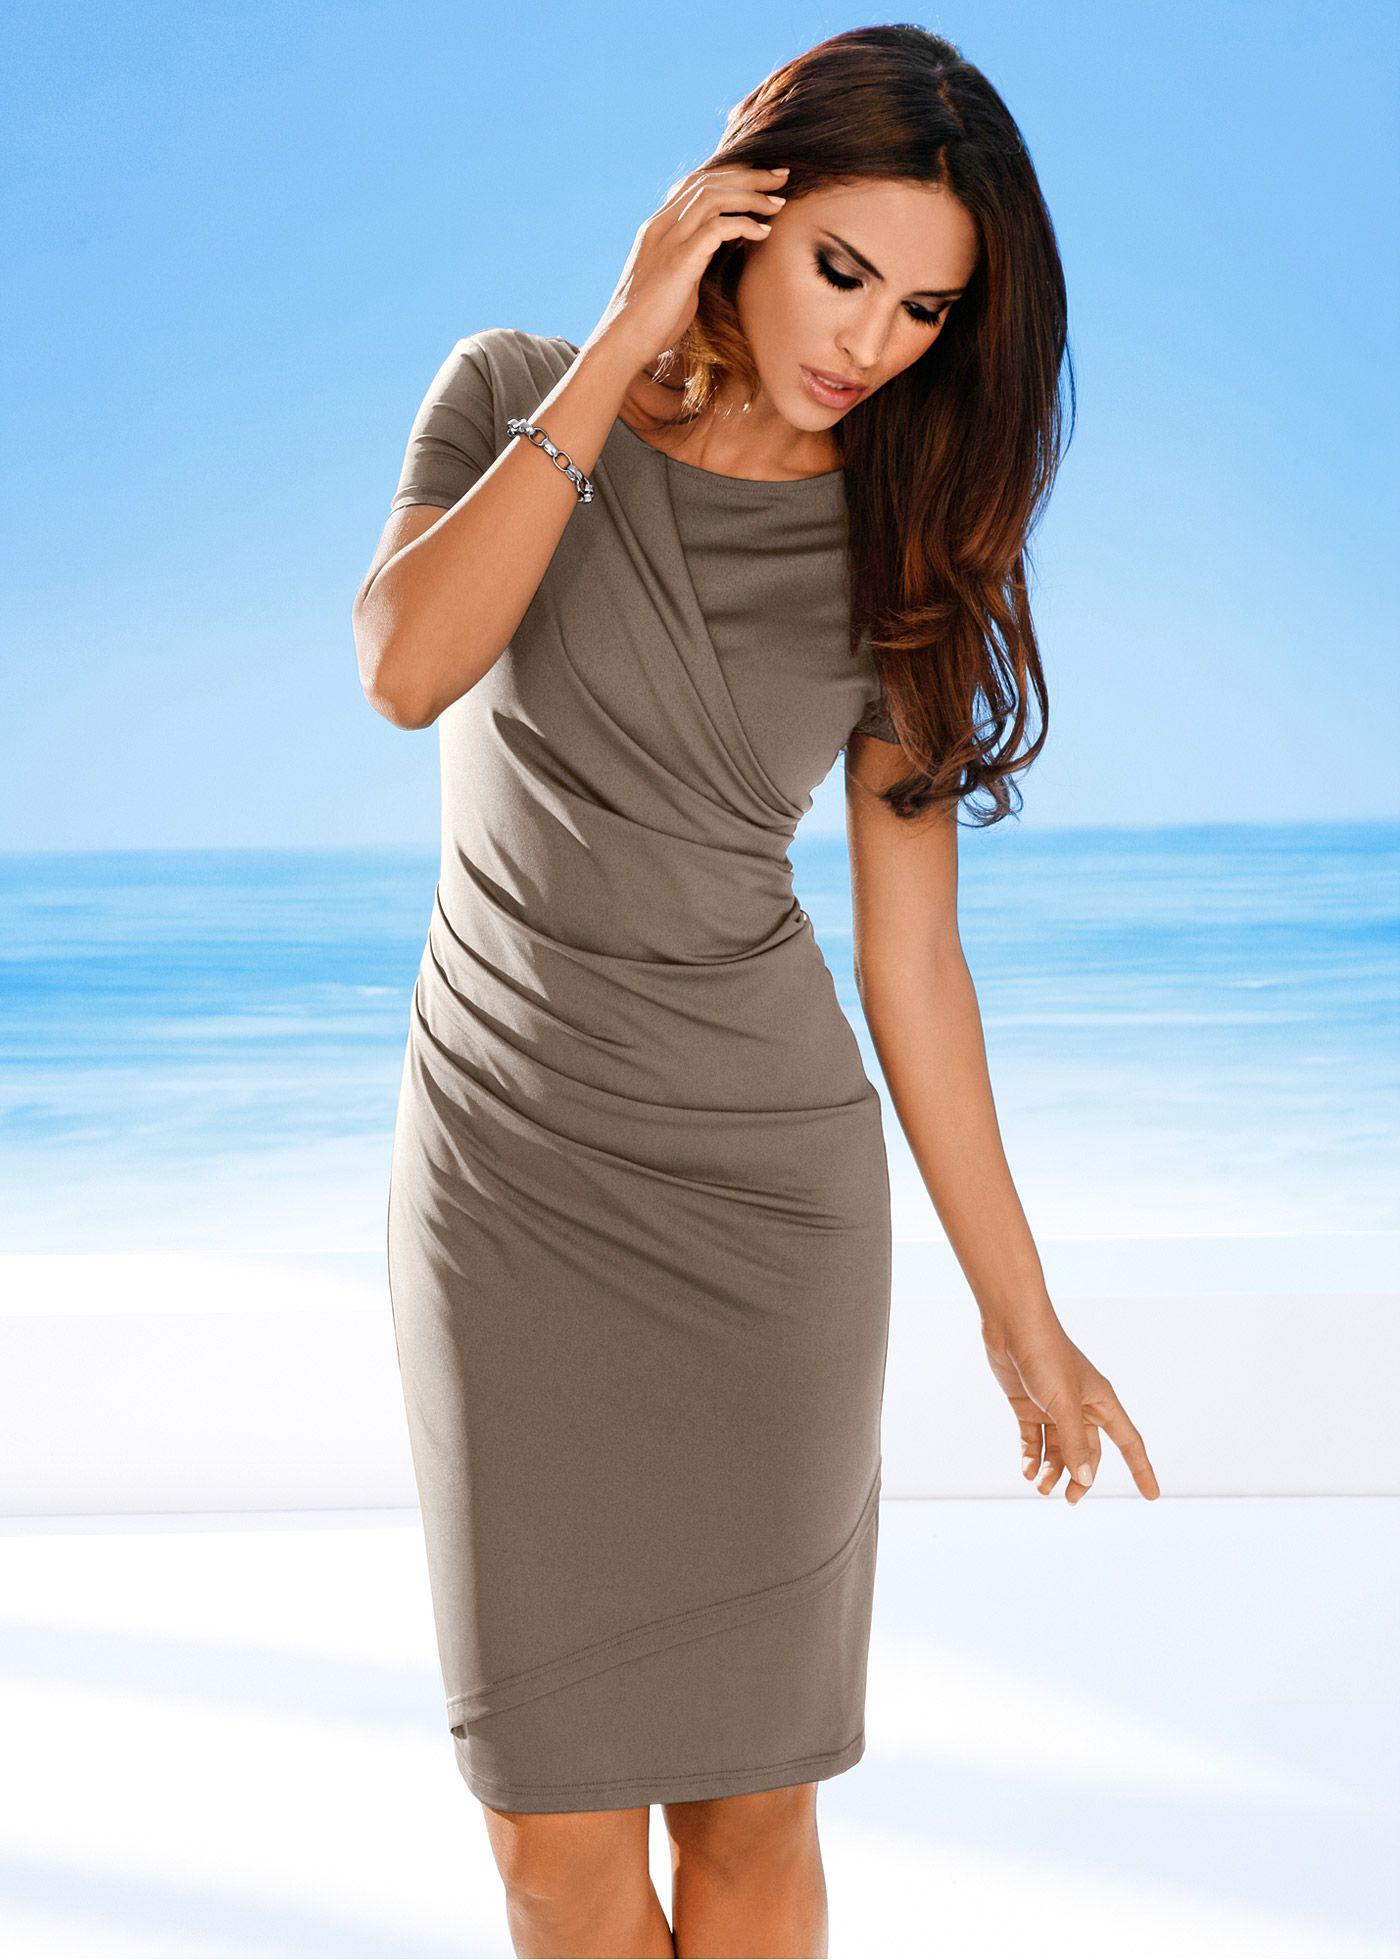 12c8ed2bb Vestido marrom acinzentado encomendar agora na loja on-line bonprix ...